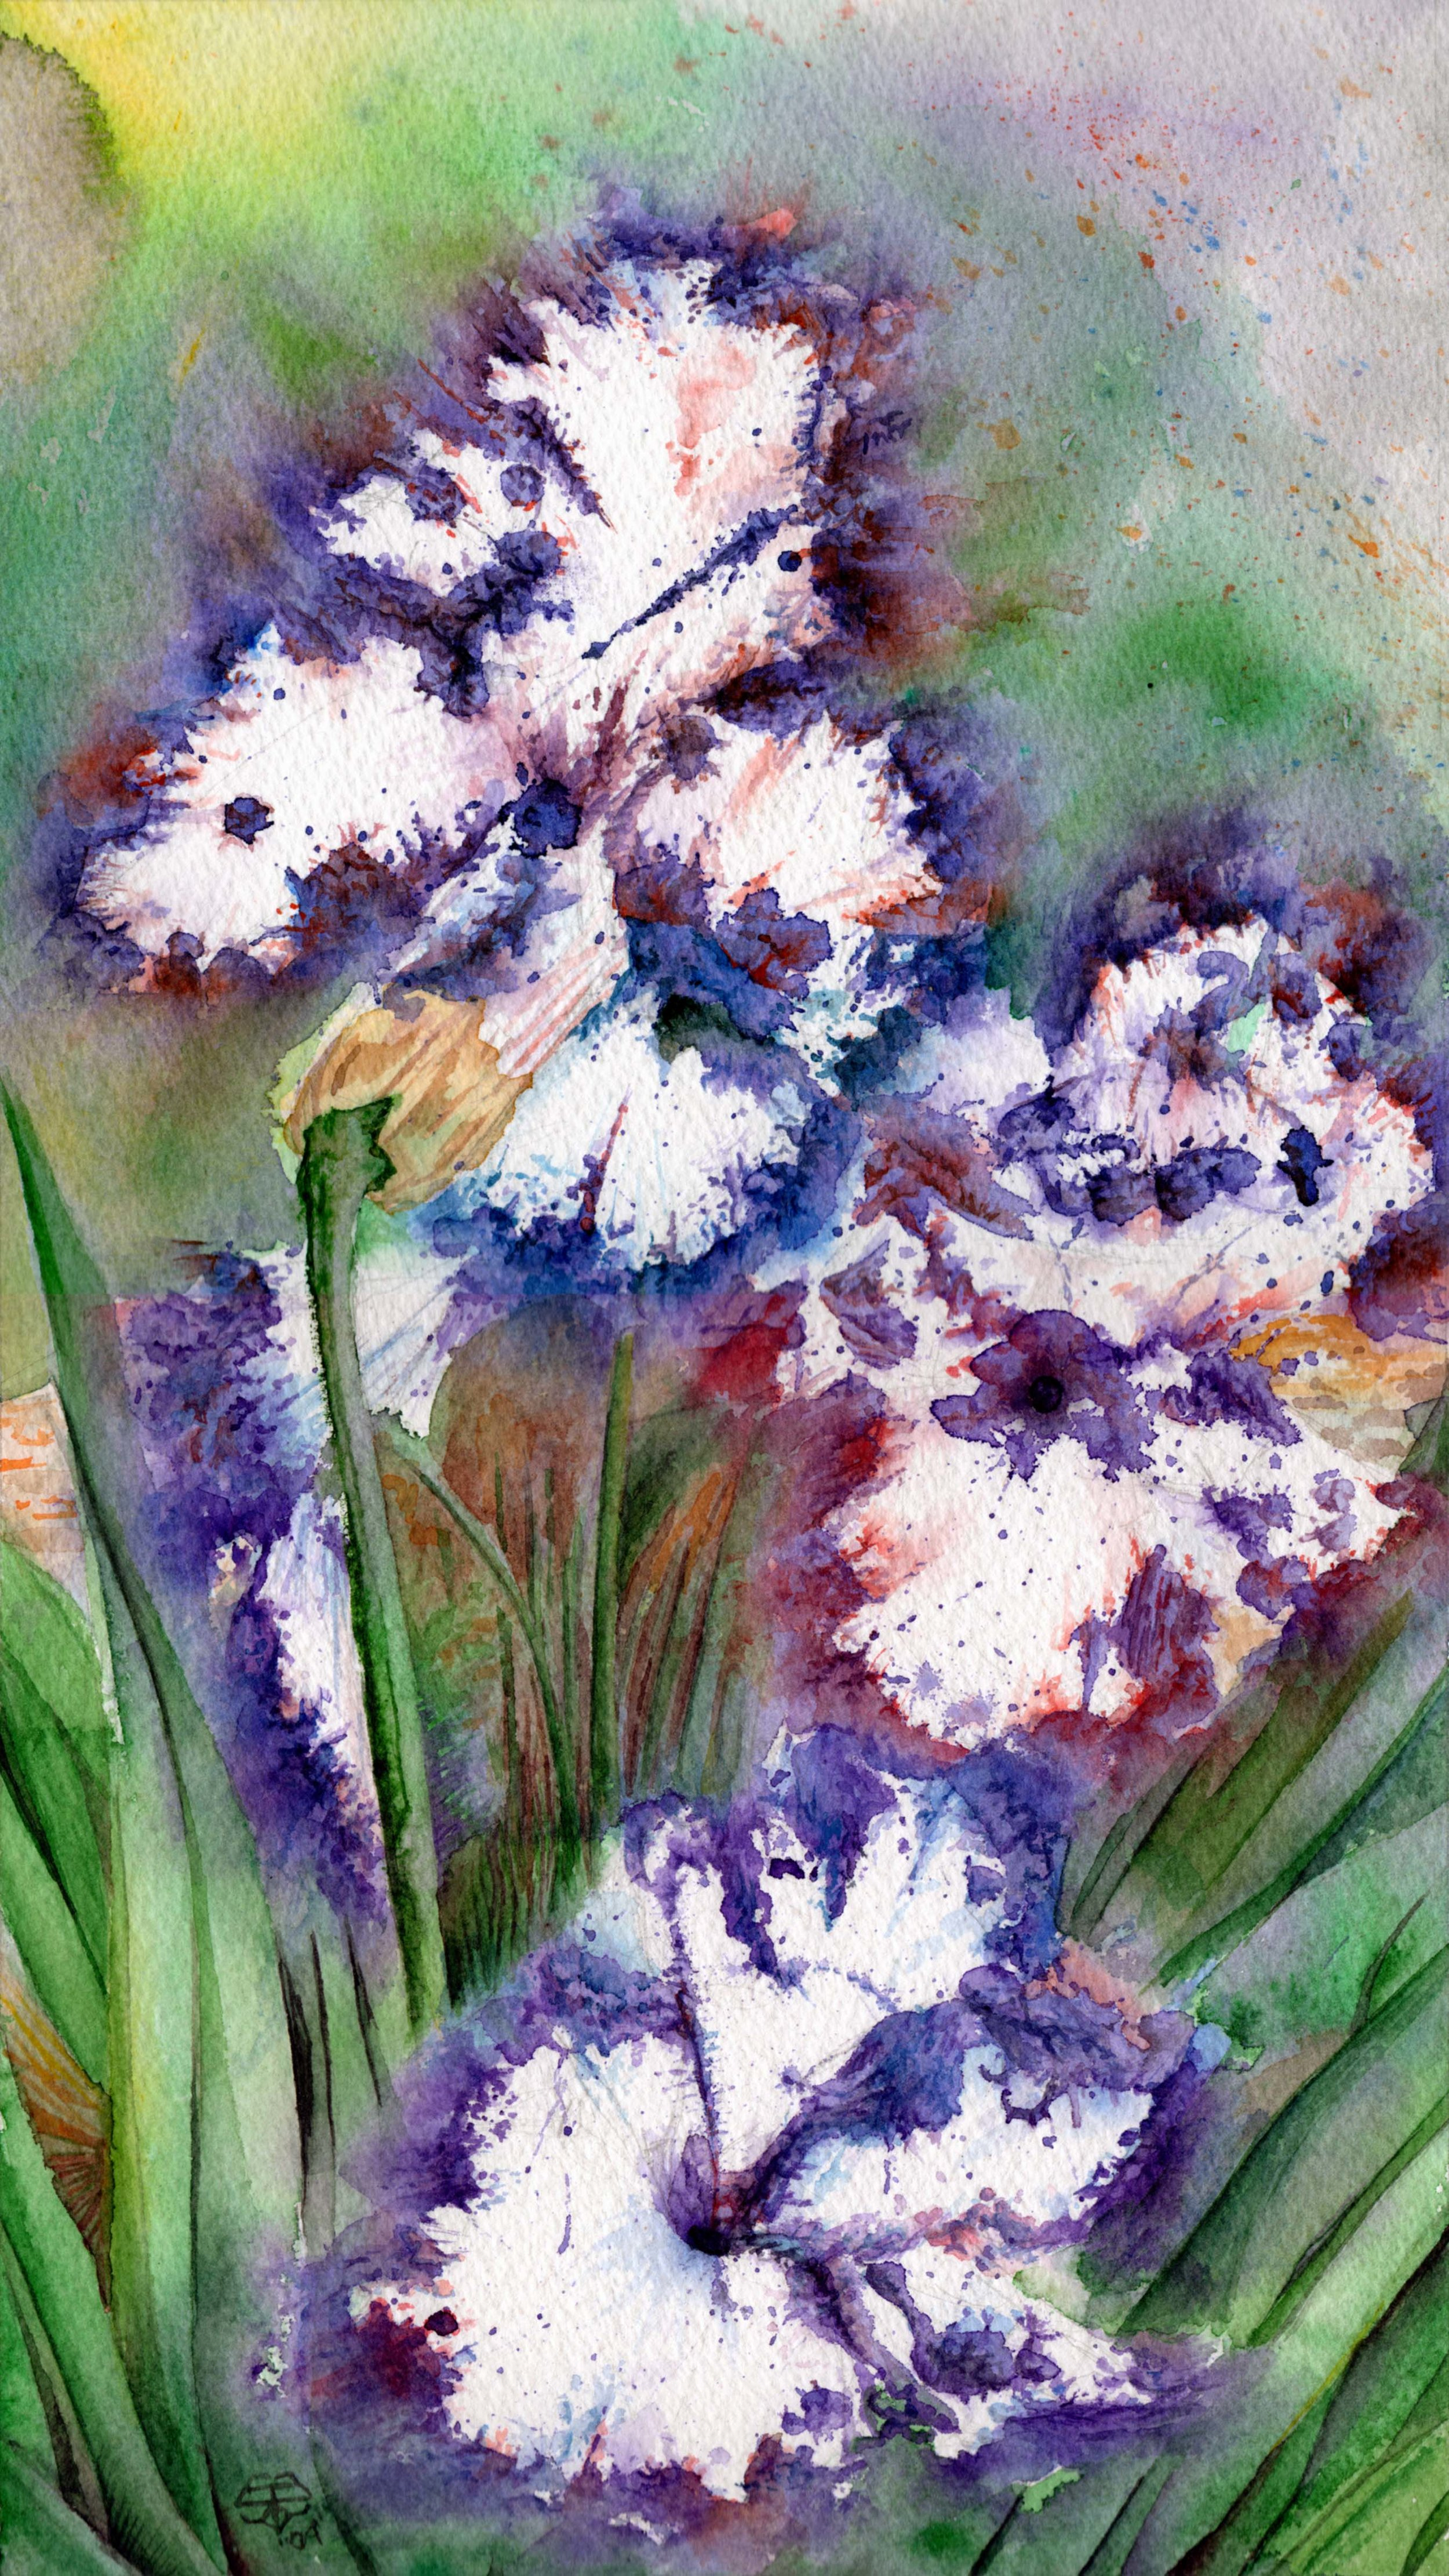 Flowers in Full Boom